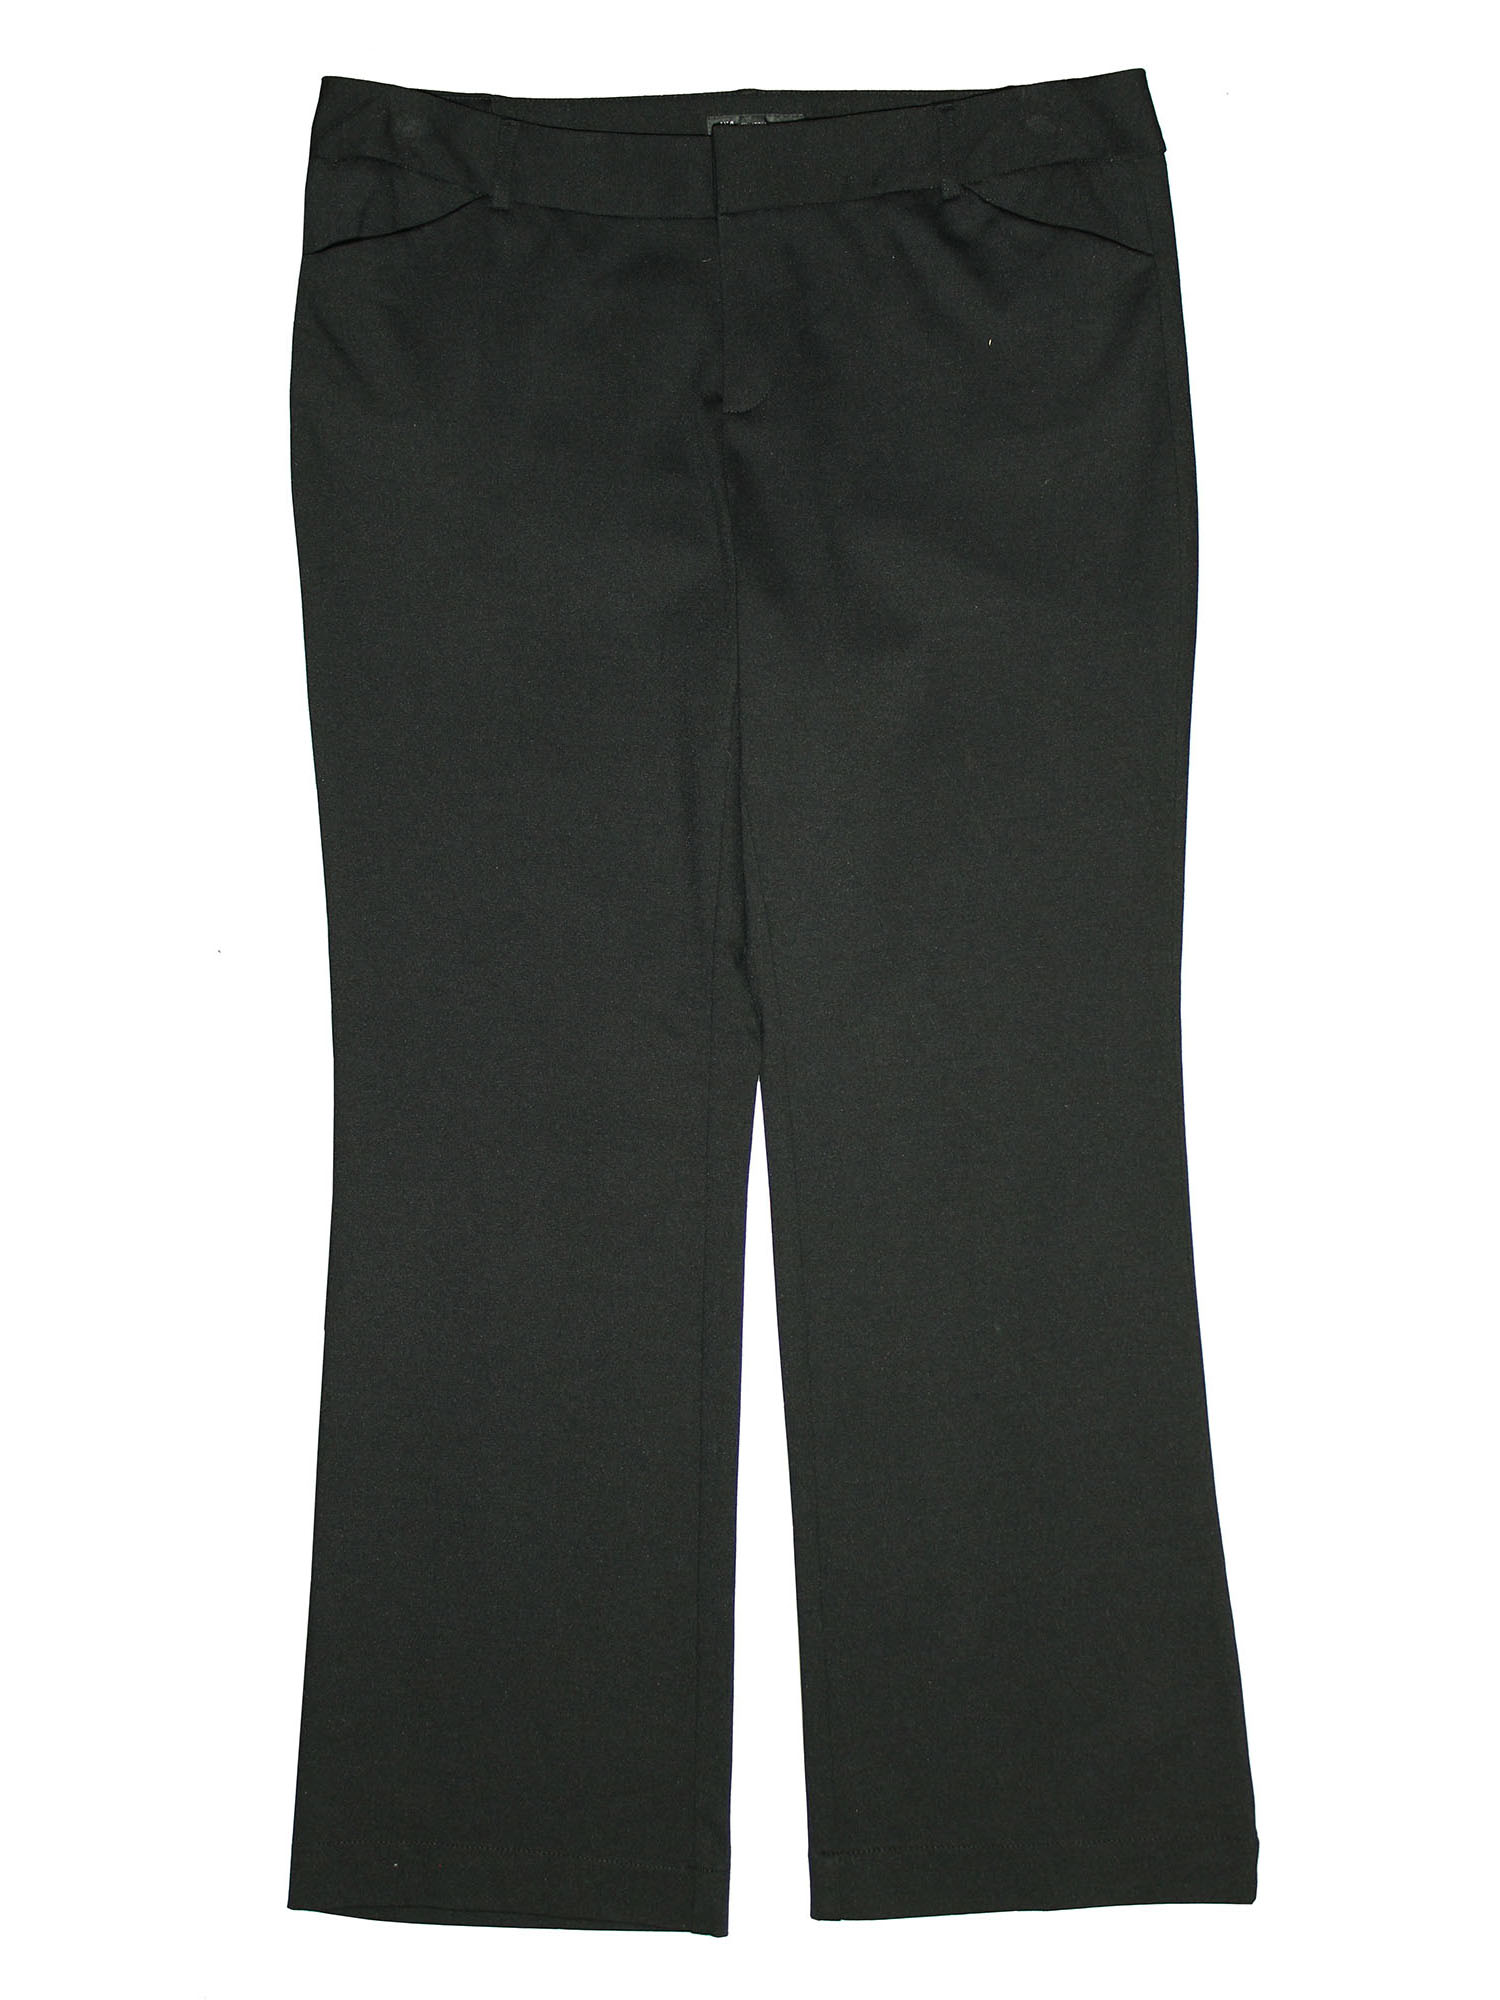 INC Works Women's Plus Straight Leg Pants Slacks 24w Petite Deep Black